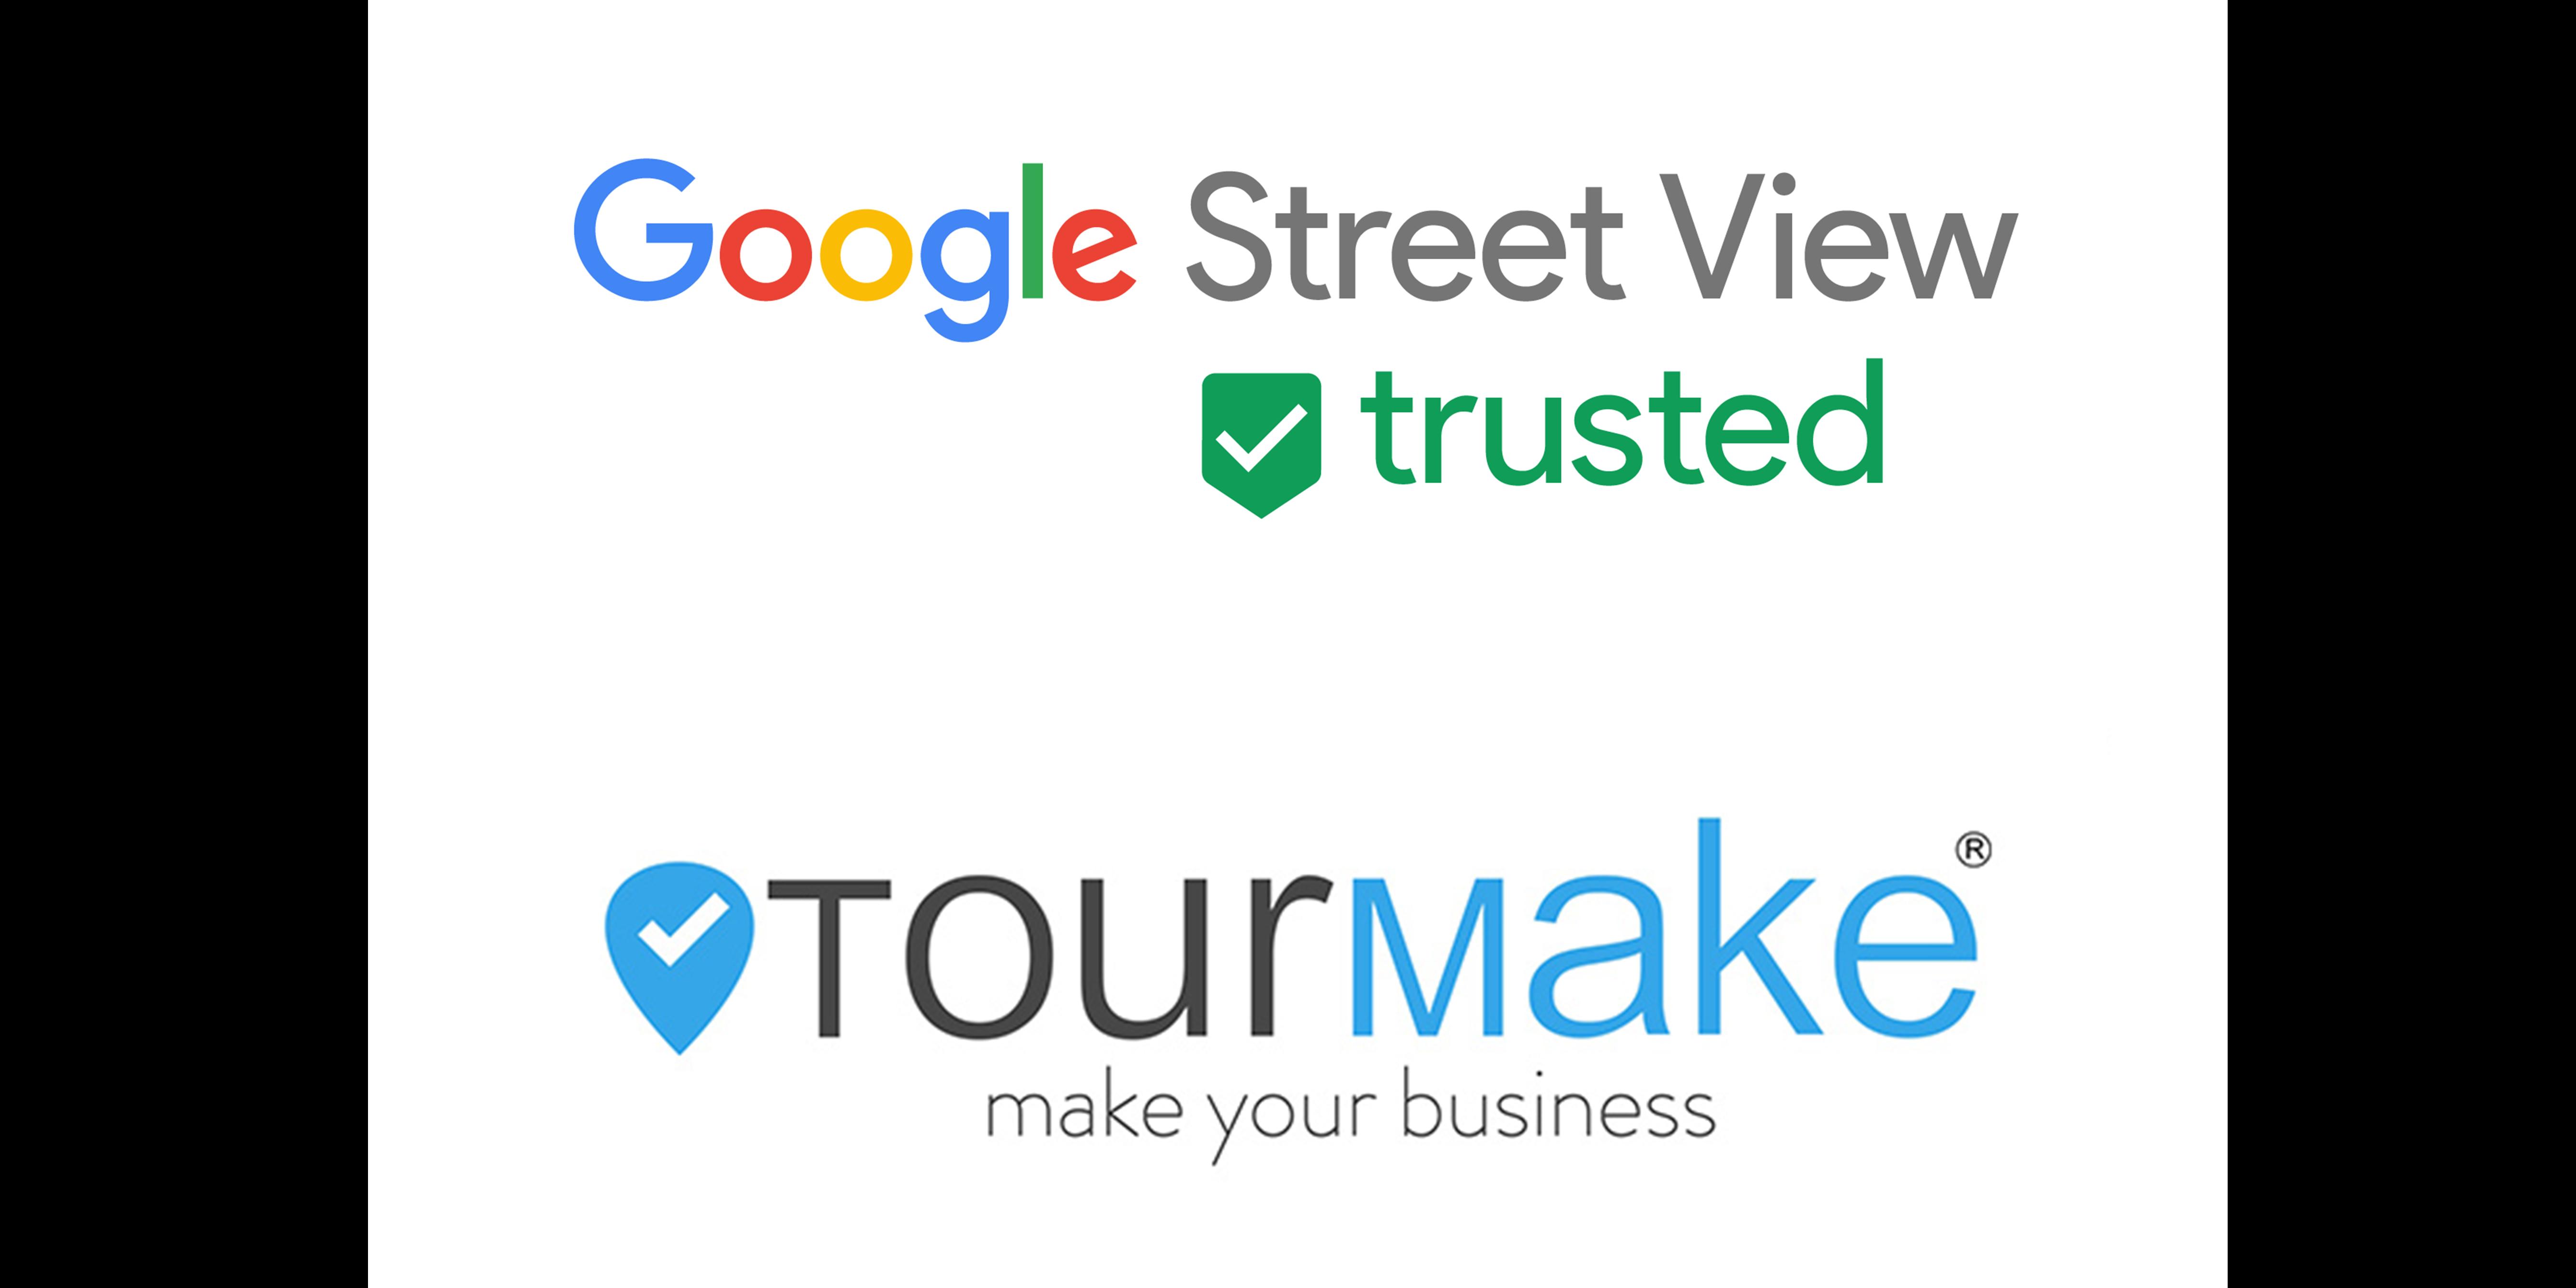 Googleストリートビュー_TourMake